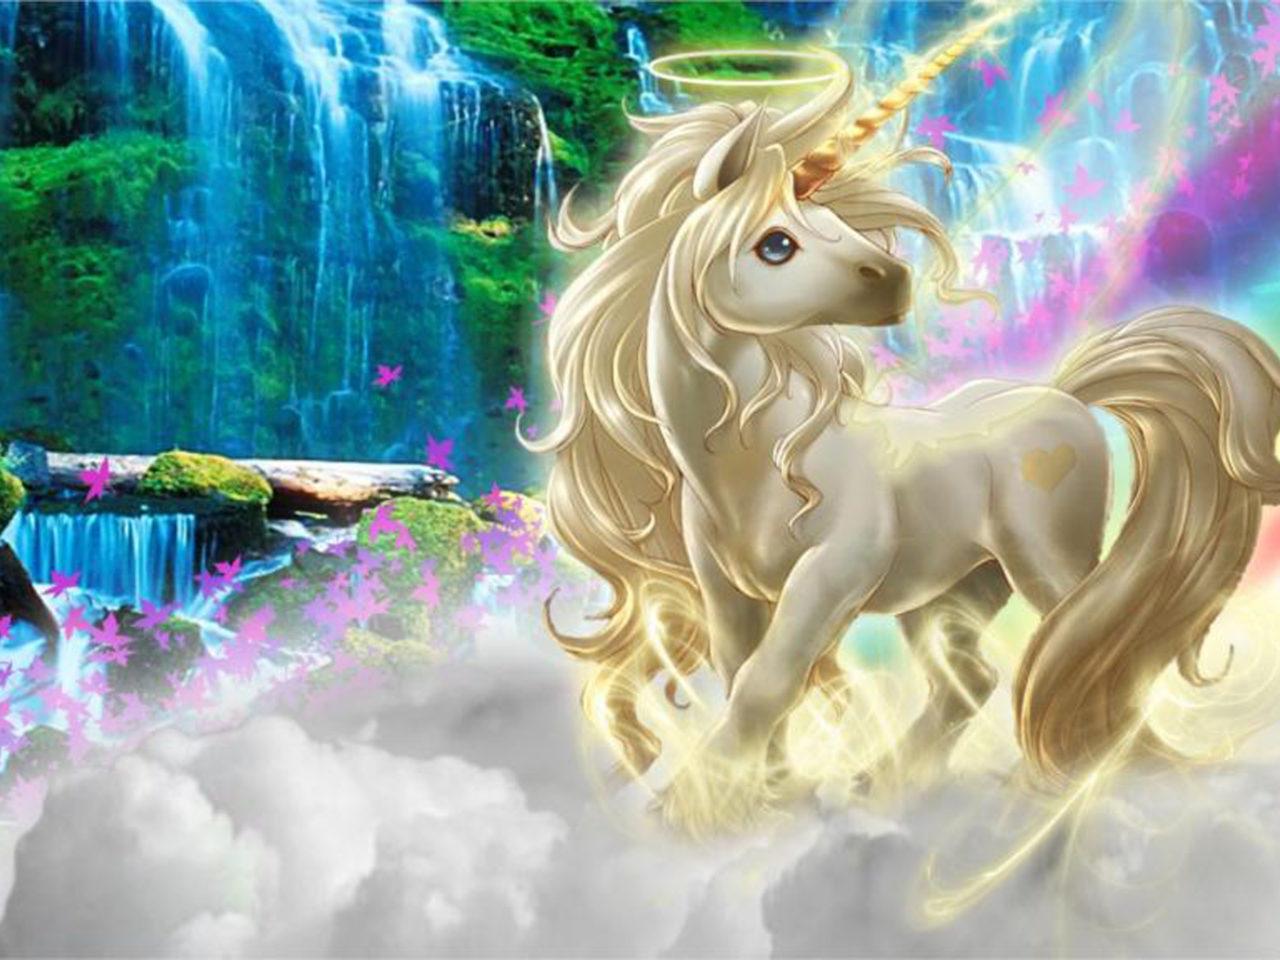 3d Animal Wallpaper Desktop Beautiful 3d Picture Unicorn Silk Clouds Rainbow Wallpaper